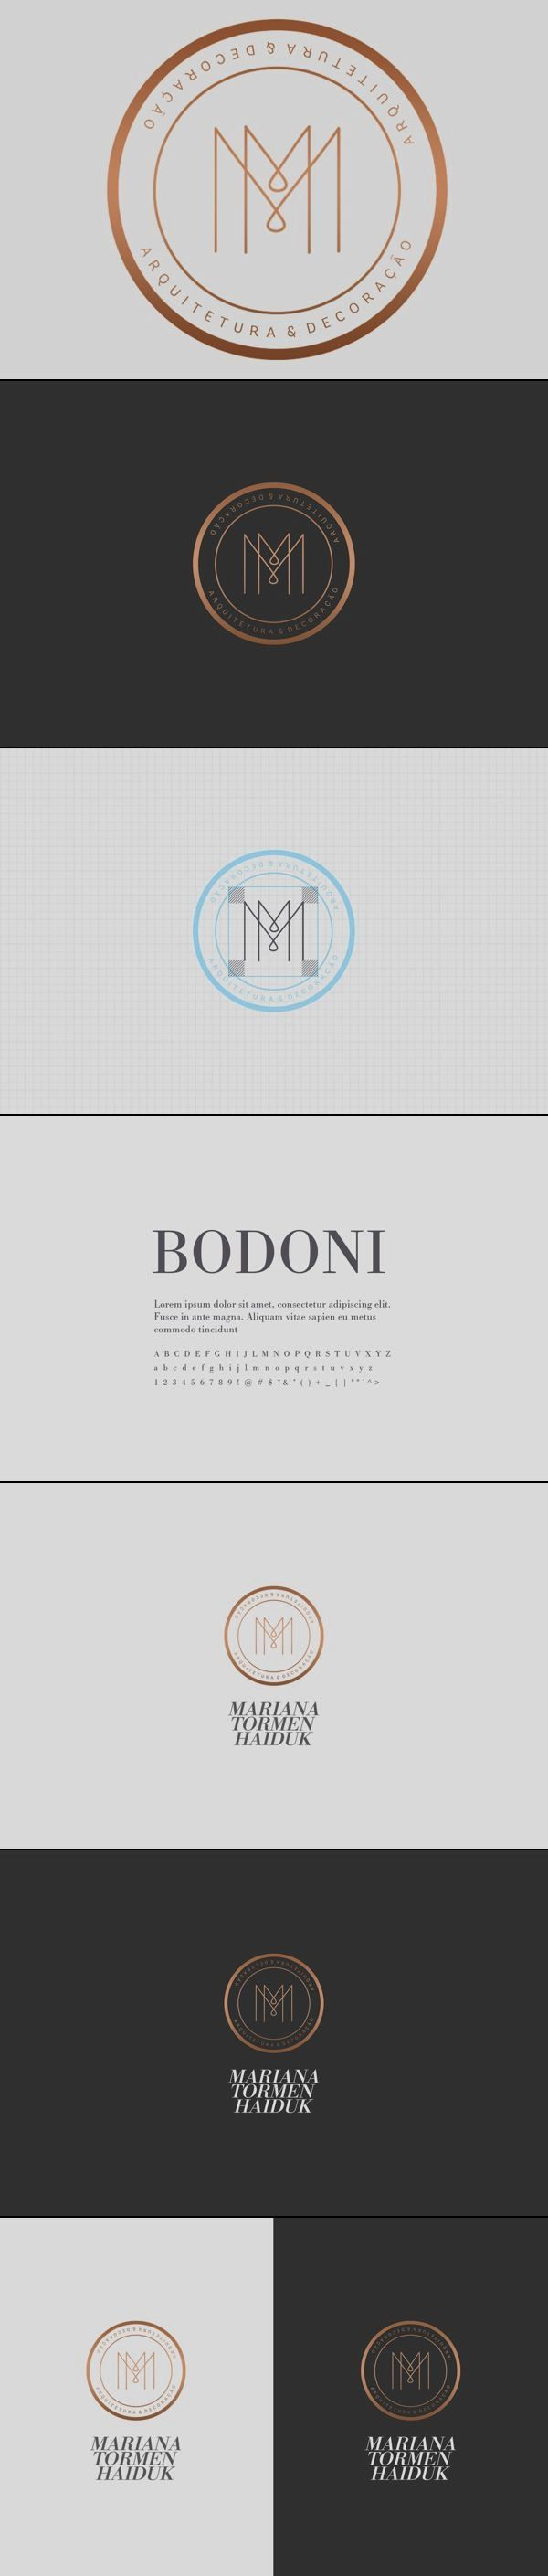 note: Mariana Tormen Haiduk Architecture Logo Design & Brand Identity by Estúdio Alice via Behance.